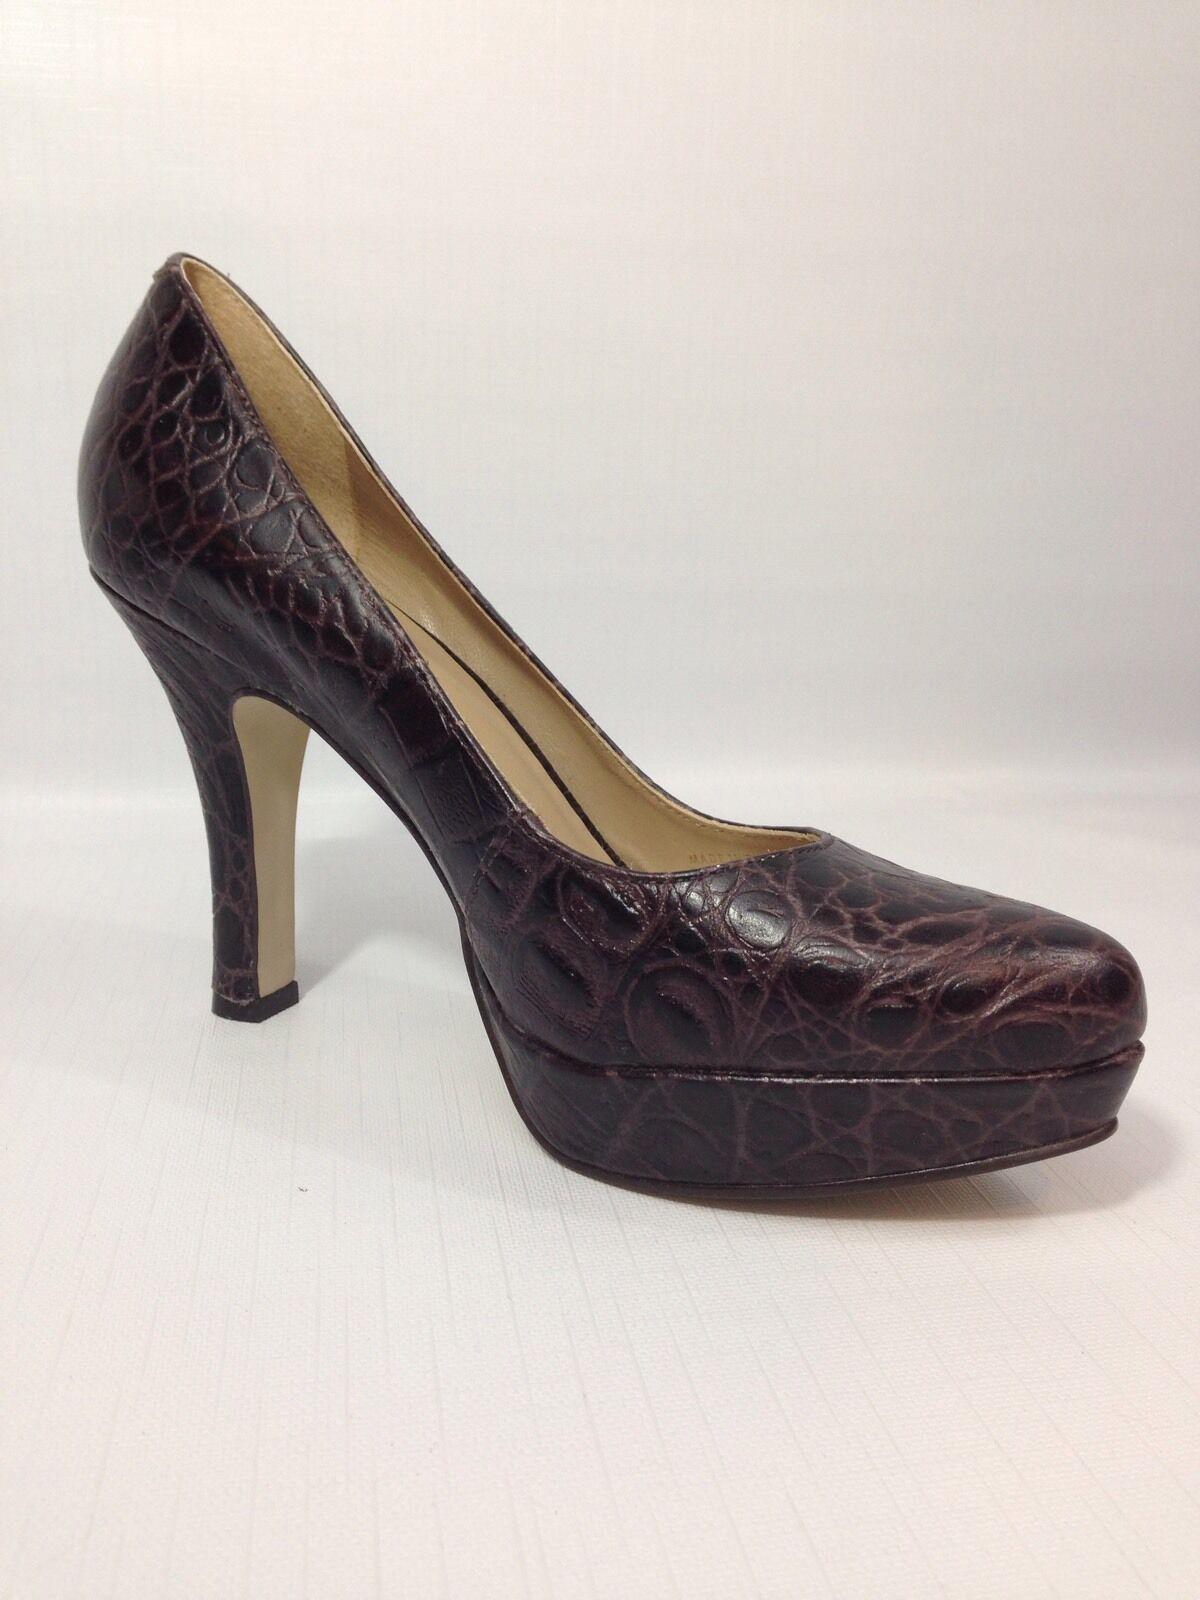 Women's Talbots Brown Croc Embossed Leather Platform Heel Pumps - 5 1 2 B NICE